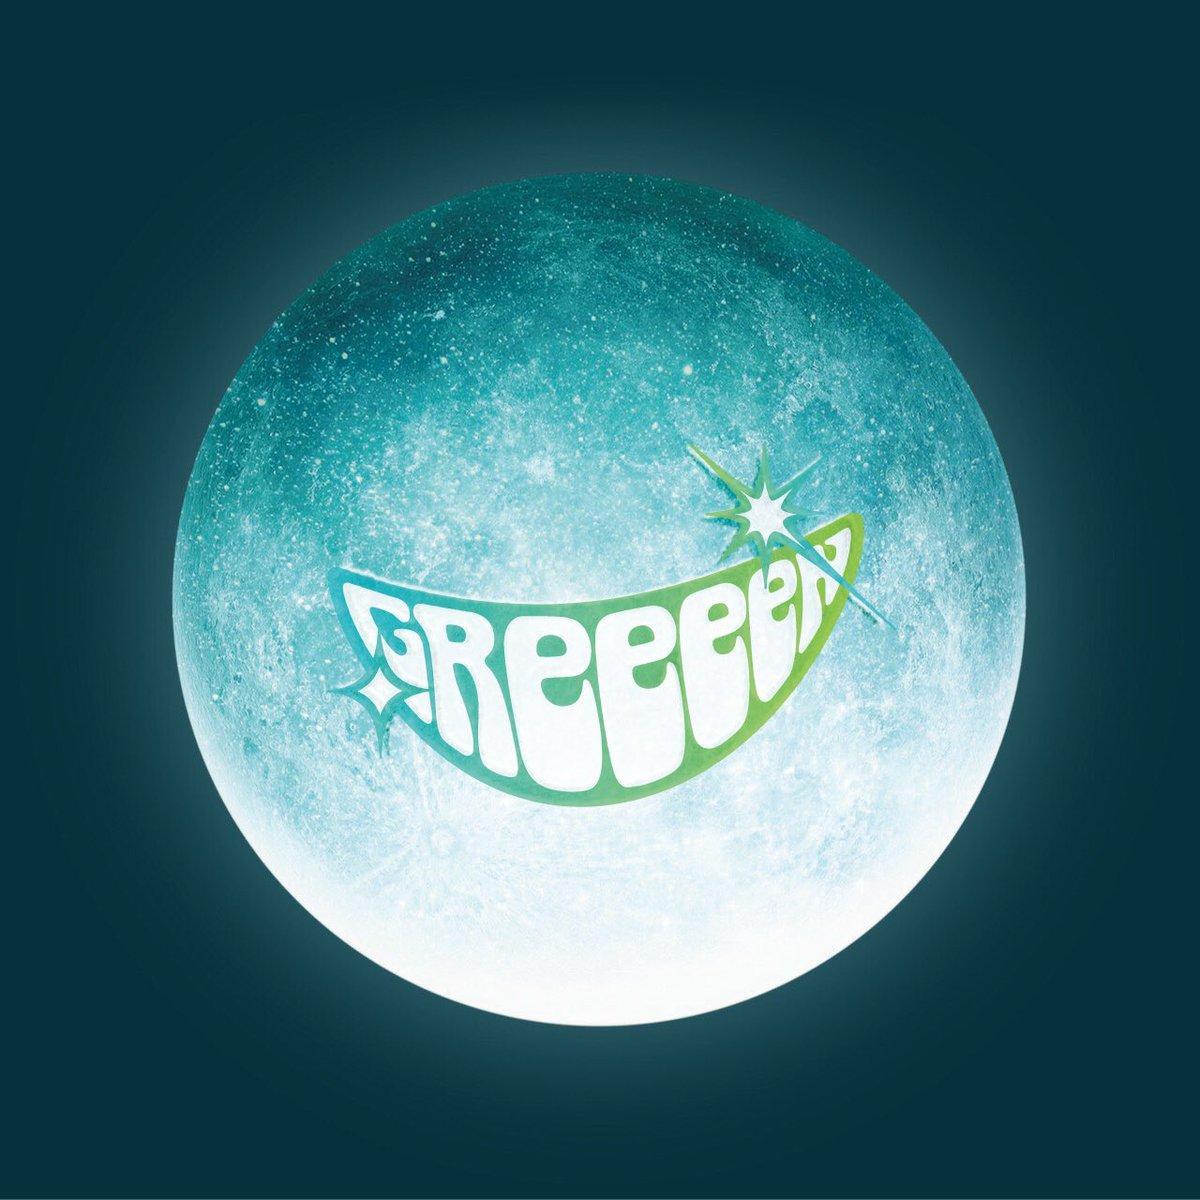 GReeeeN @「星影のエール」発売中‼︎【公式】 (@ganso_GReeeeN) | Twitter